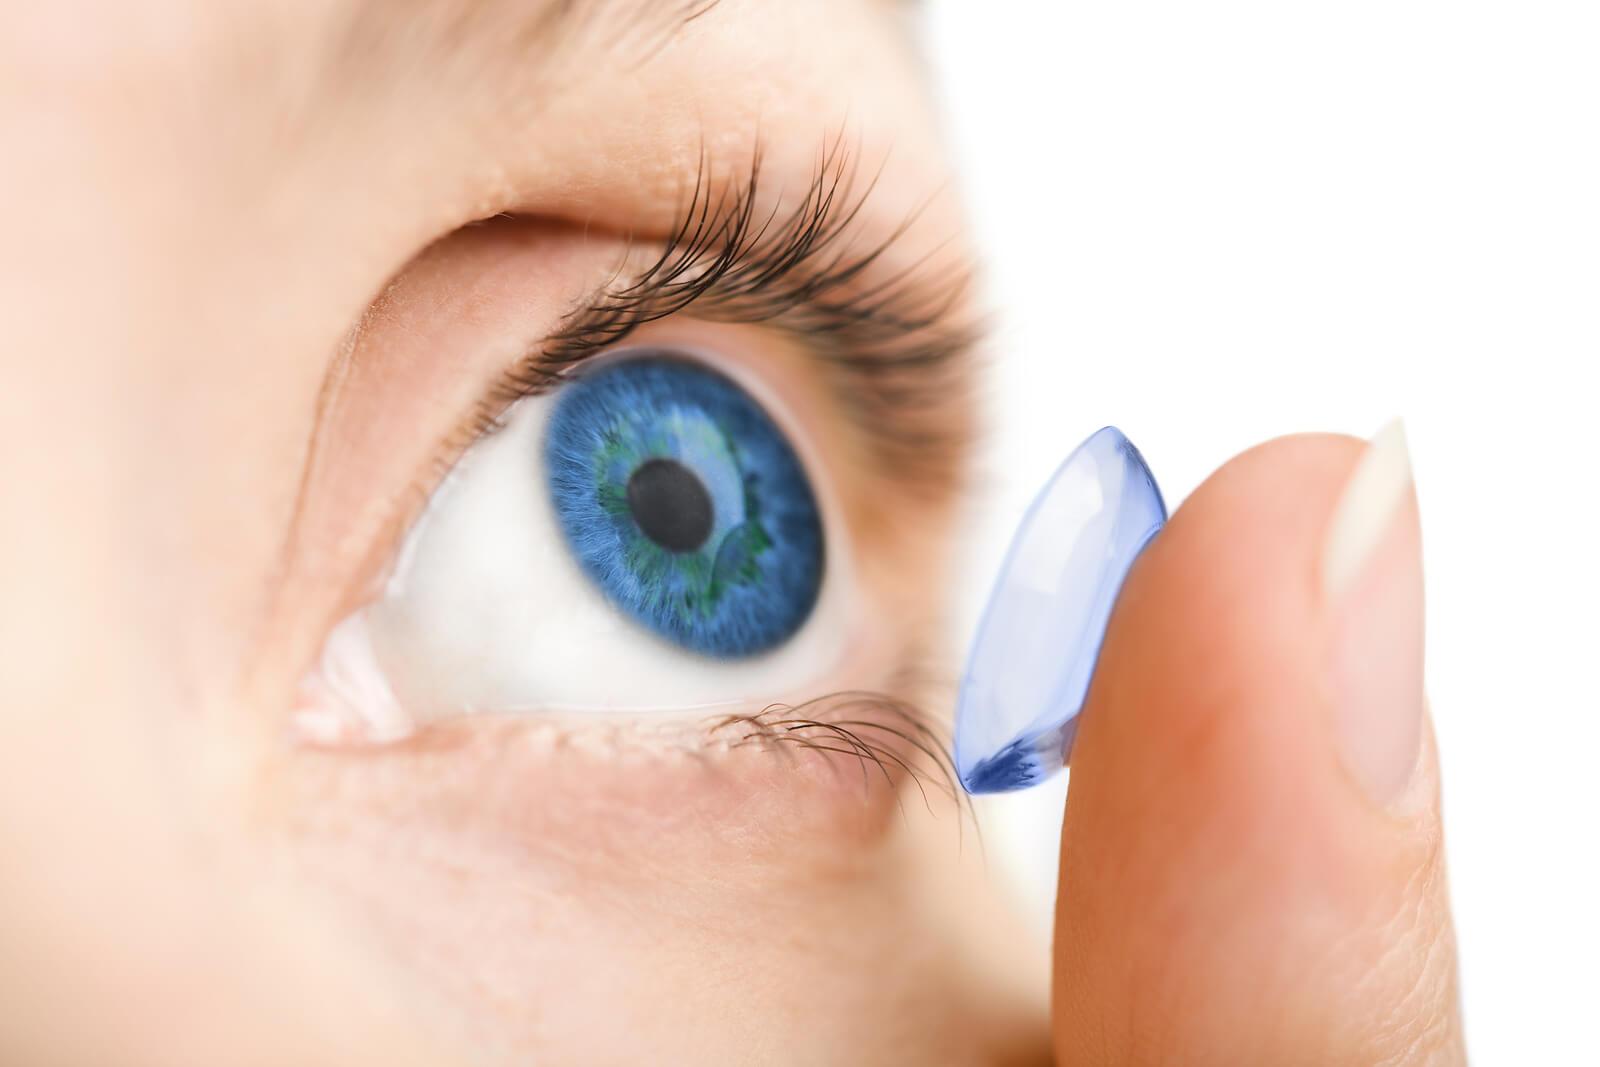 Contact-Lens-Irritations-and-Vision-Damaging-Risks